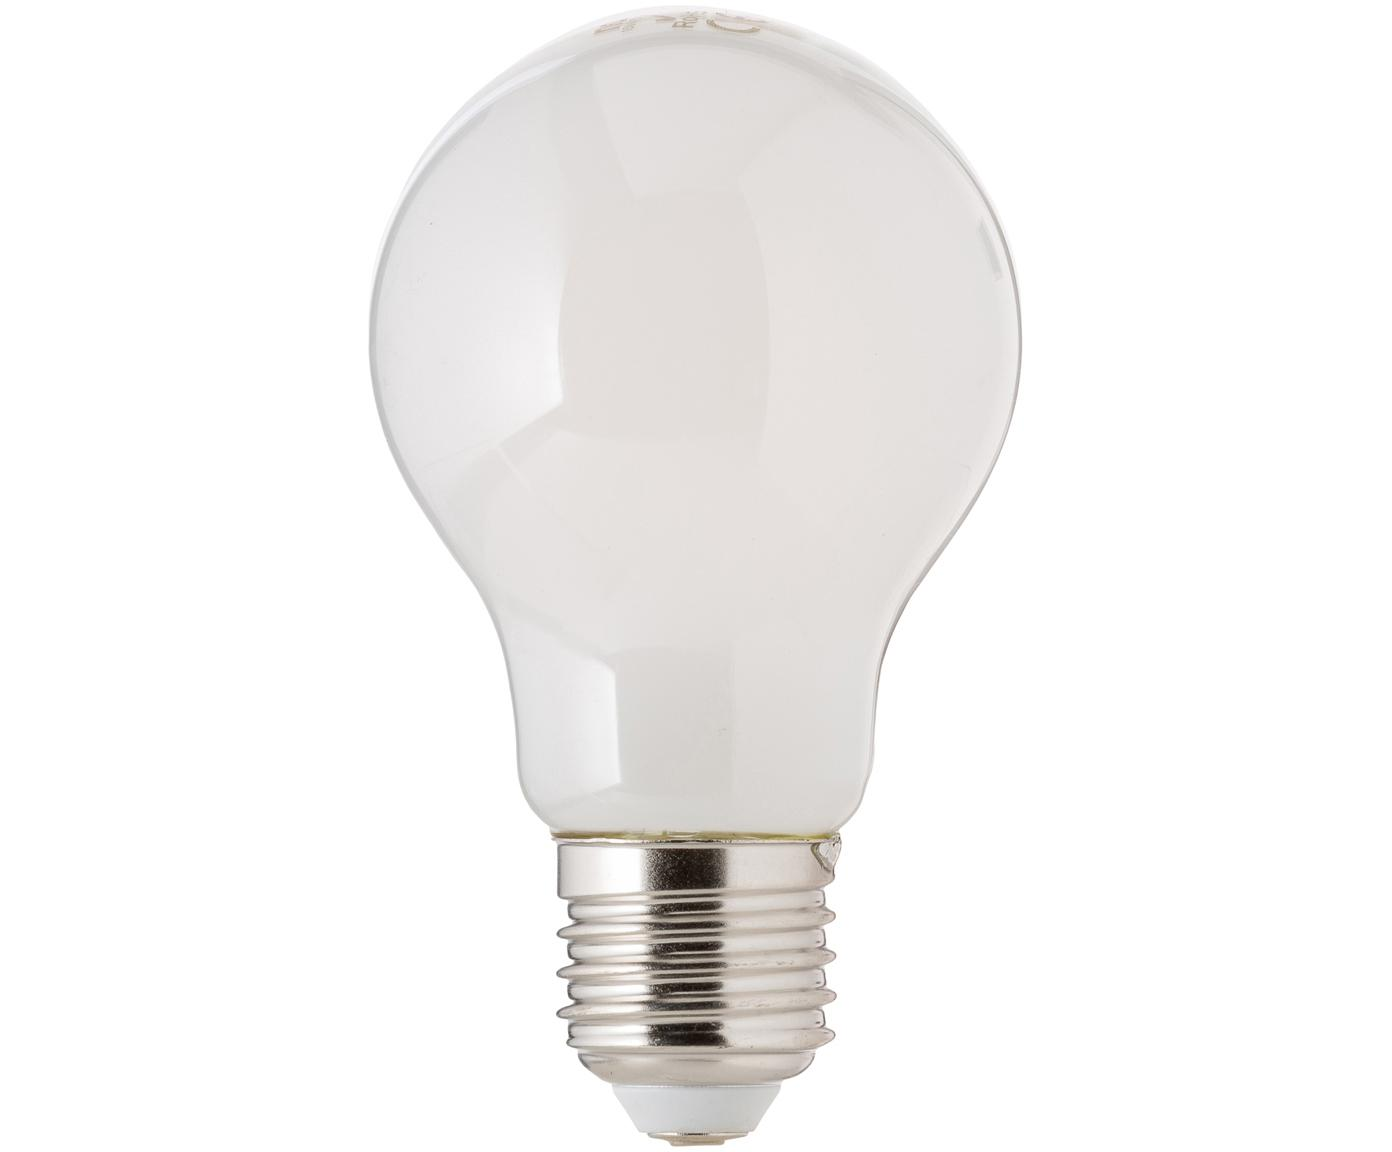 Dimbaar LED lamp Bafa (E27 / 8W), Peertje: kunststof, Fitting: aluminium, Wit, Ø 8 x H 10 cm